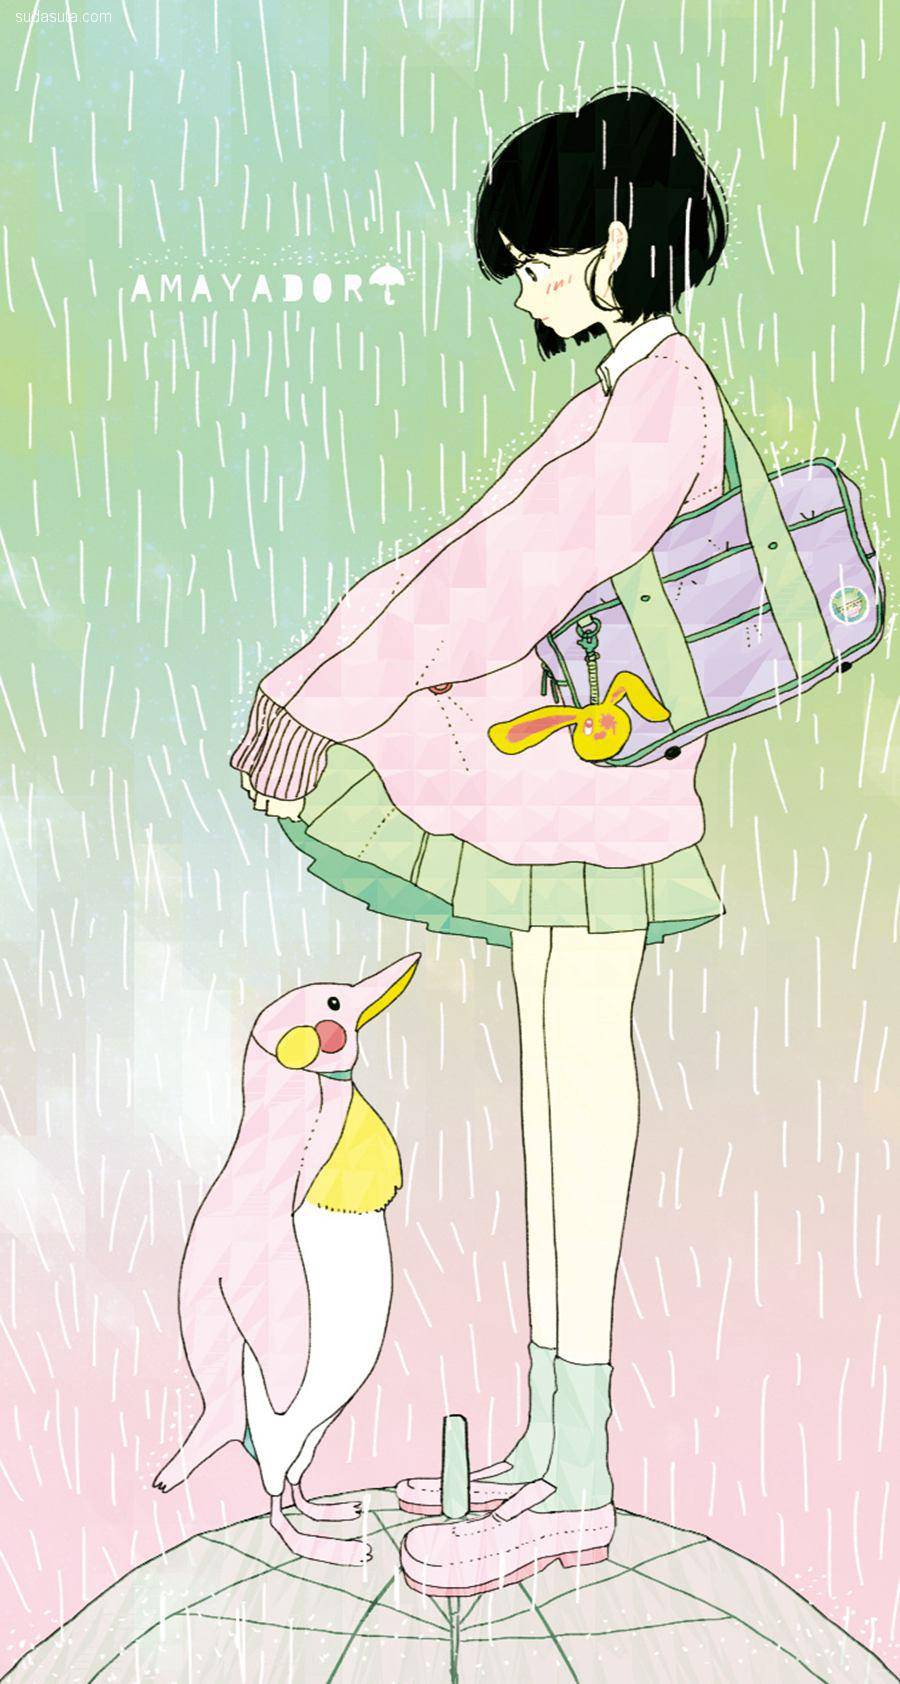 katorei 的恋爱日记